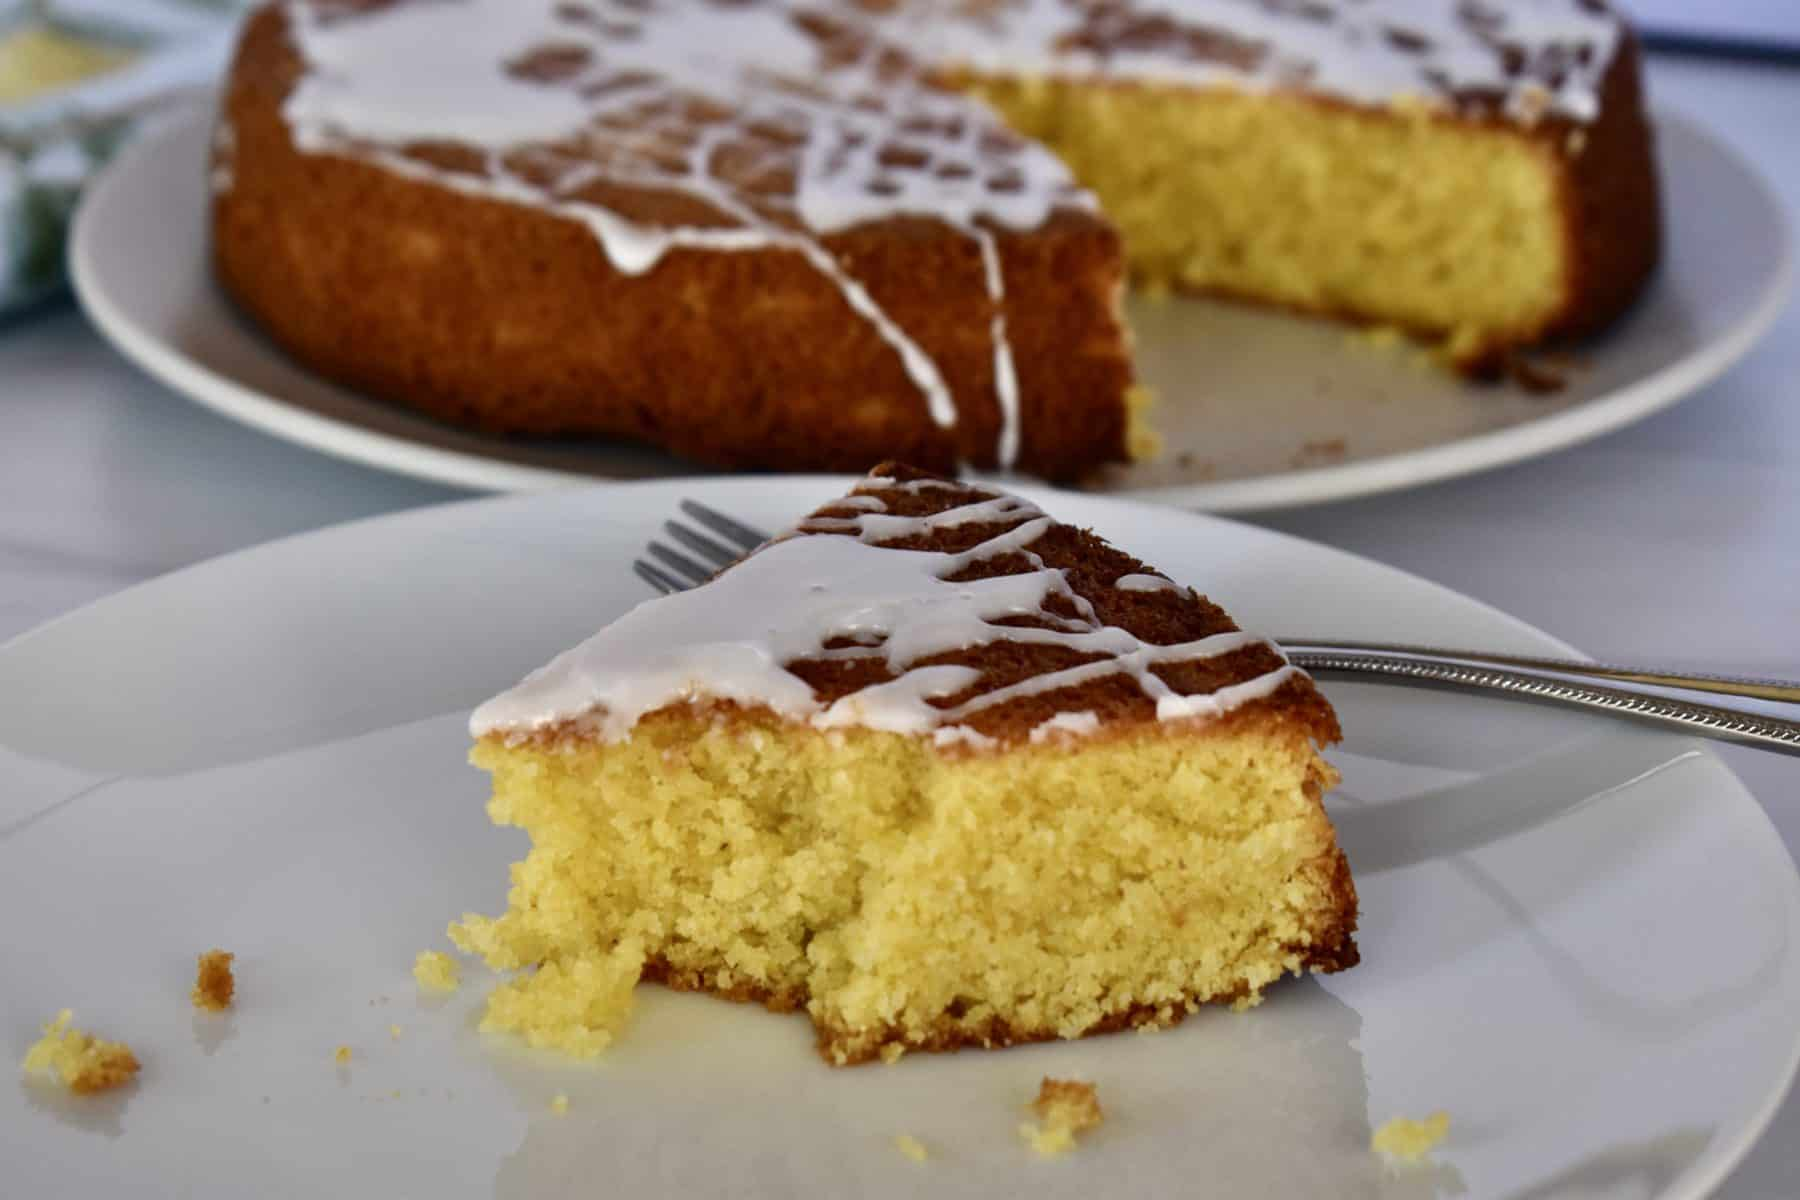 Lemon polenta cake on a white plate with a fork.